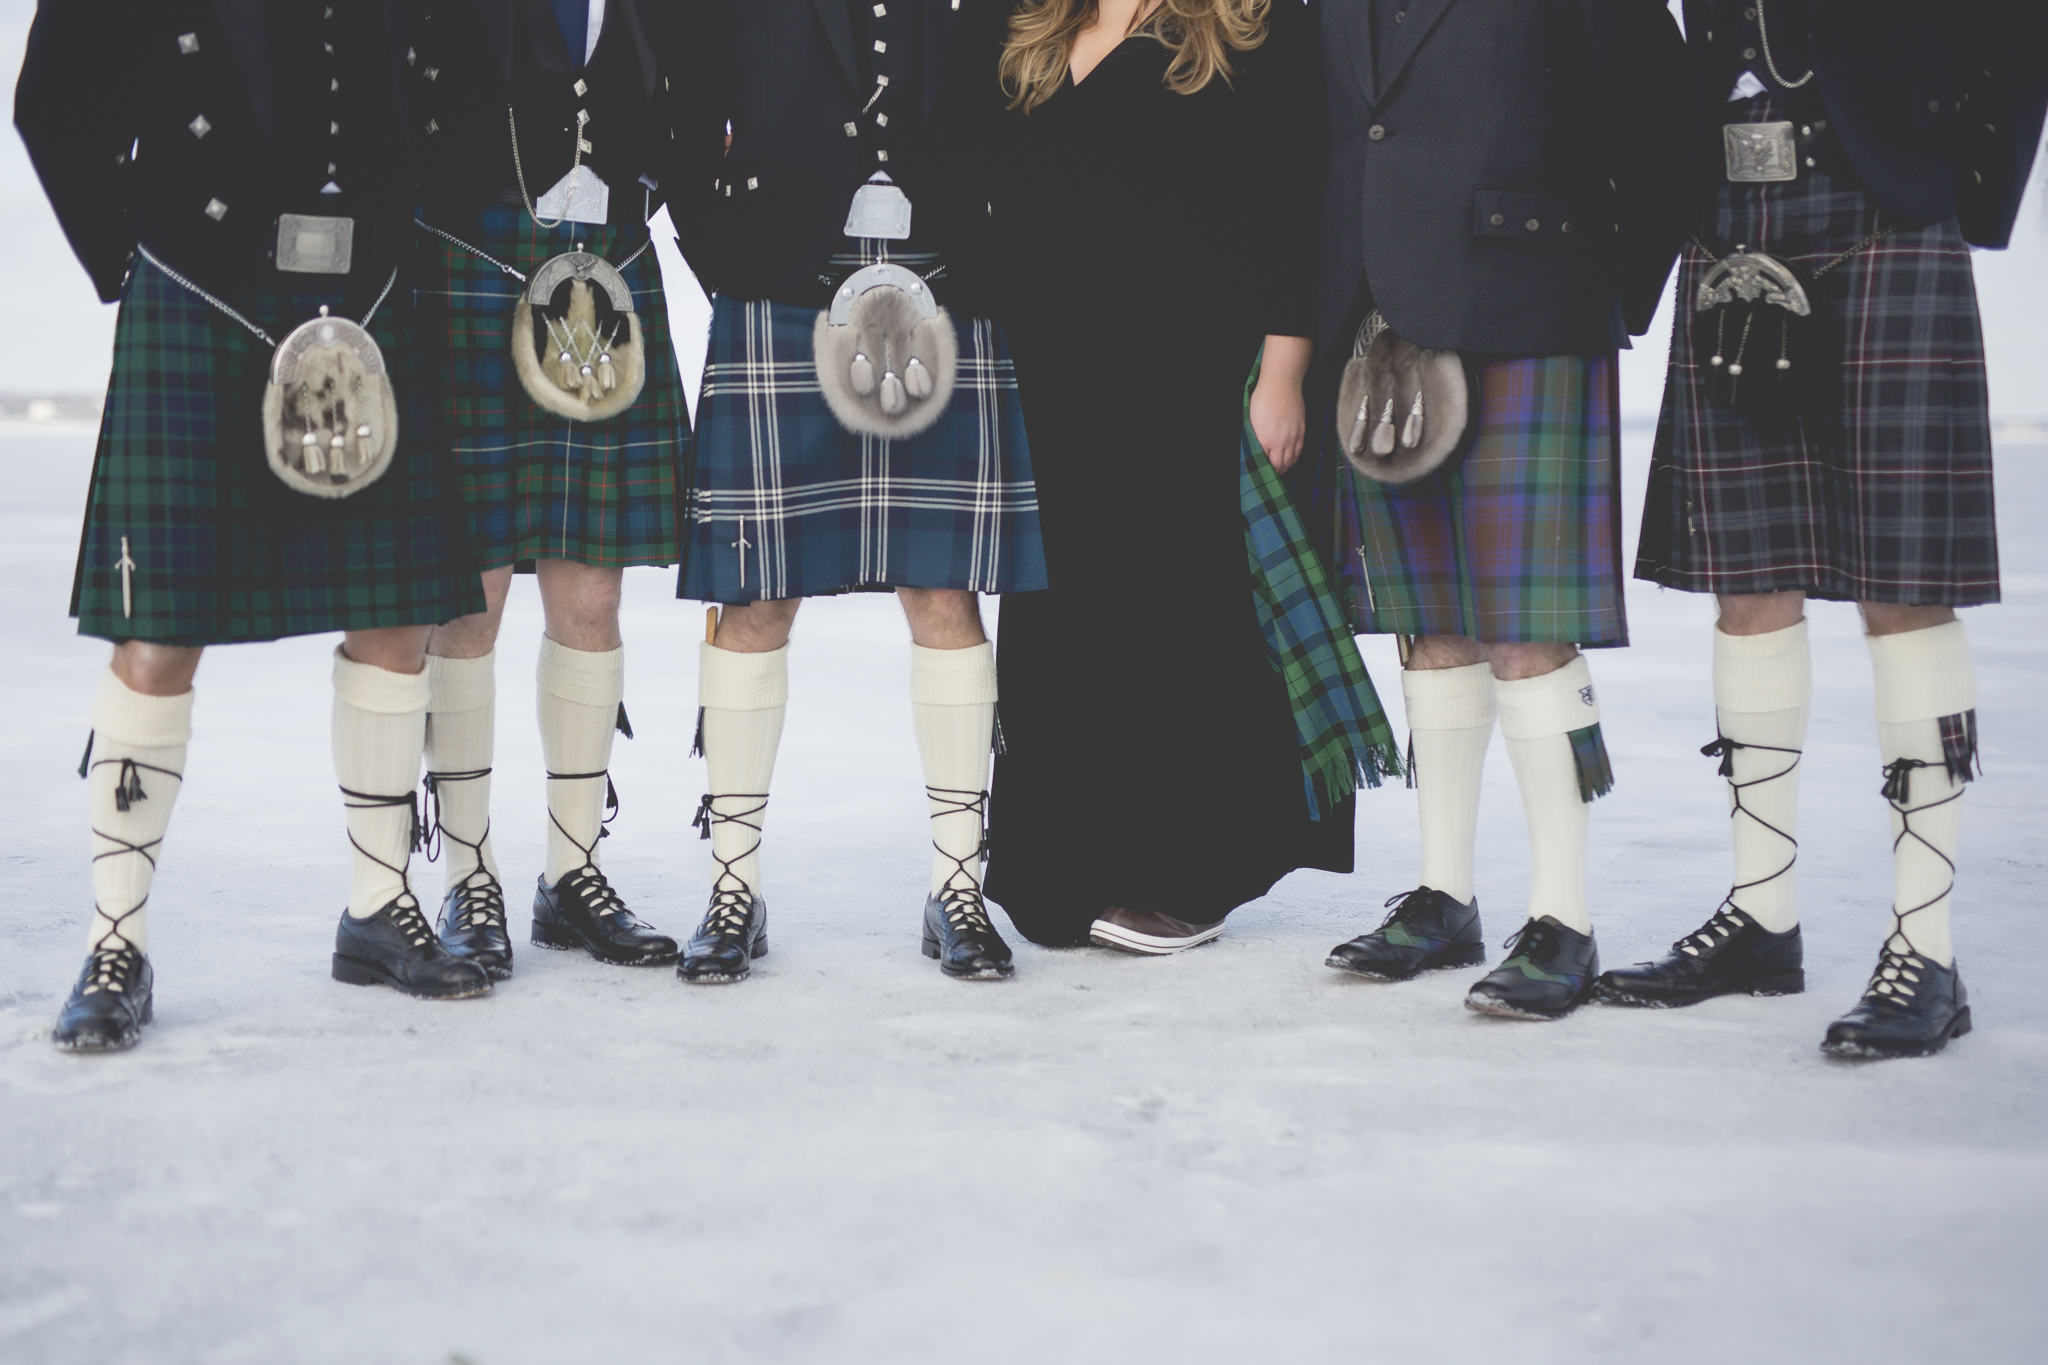 minneapolis winter wedding photographer-13.jpg